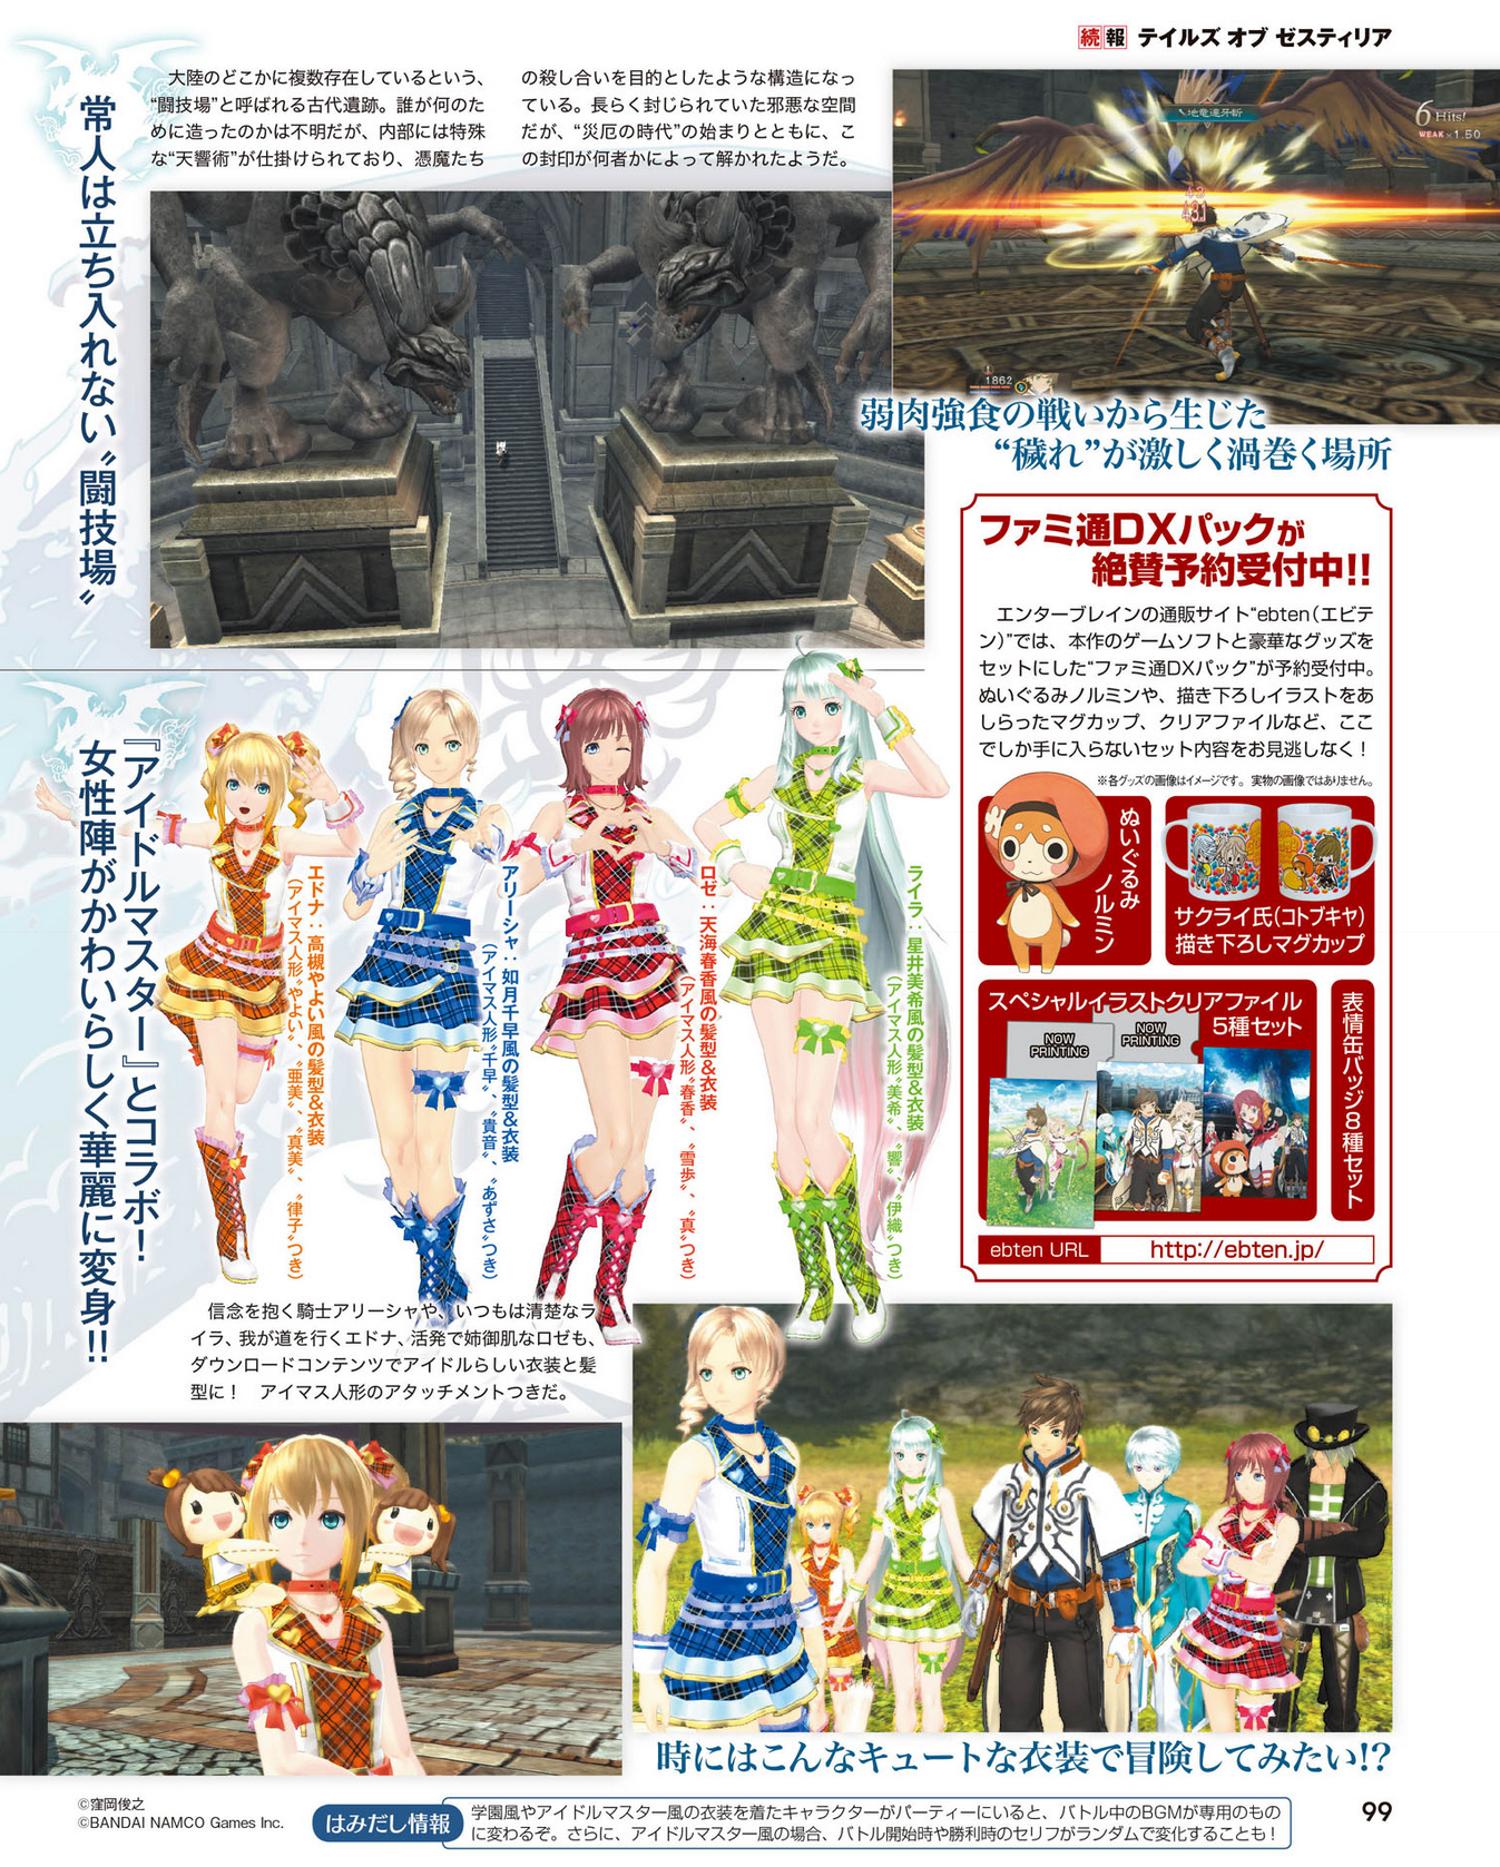 Zestiria - Idolmaster Costumes